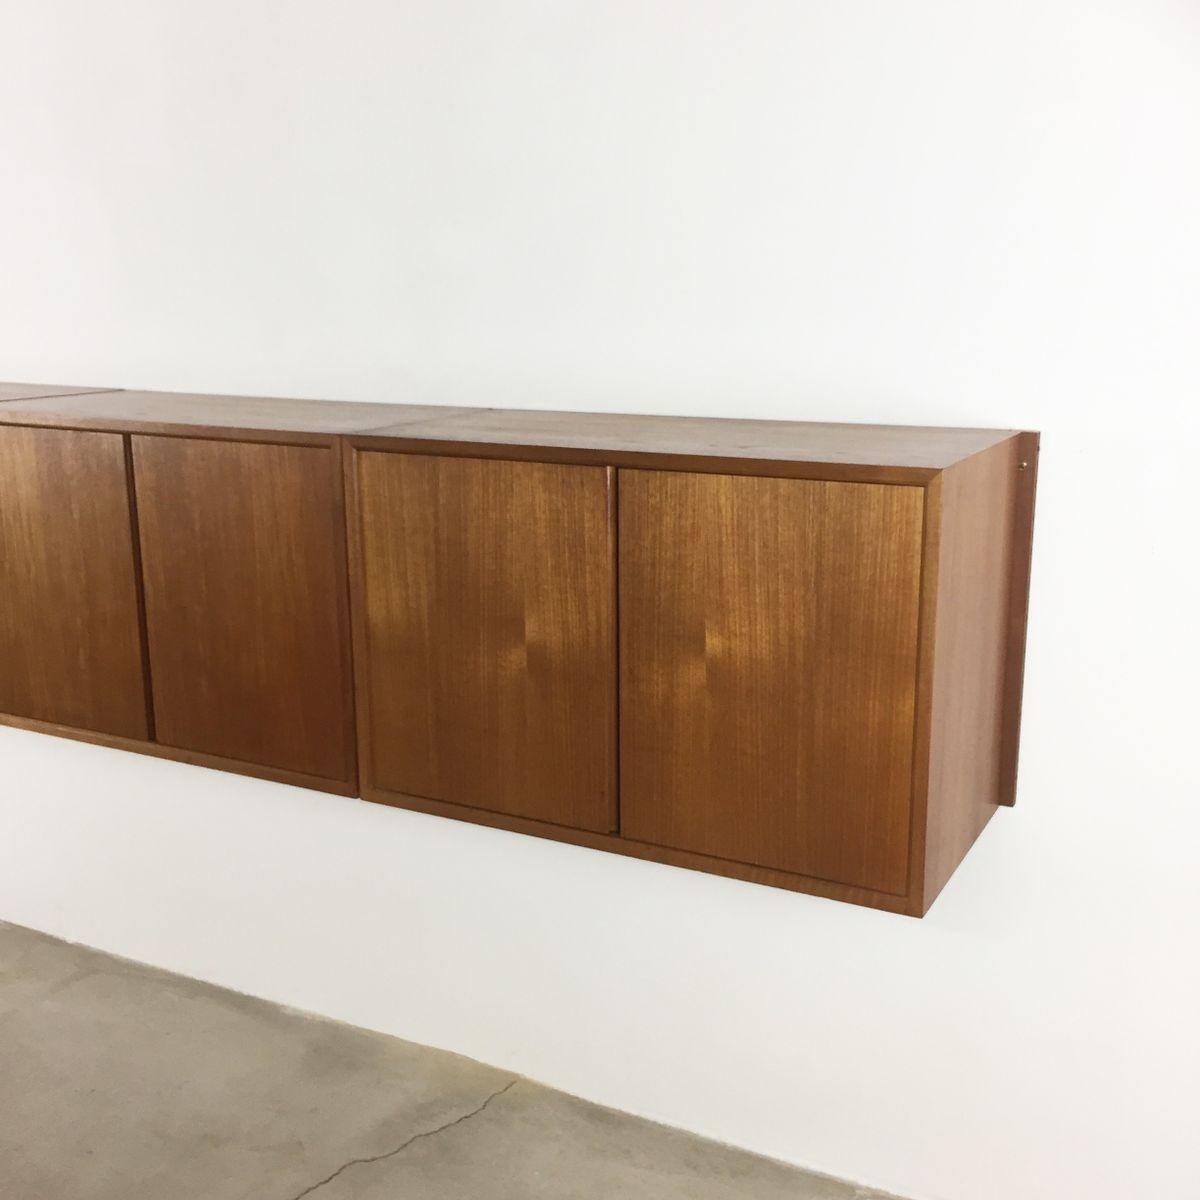 schwebendes royal system sideboard von poul cadovius f r cado 1960er bei pamono kaufen. Black Bedroom Furniture Sets. Home Design Ideas